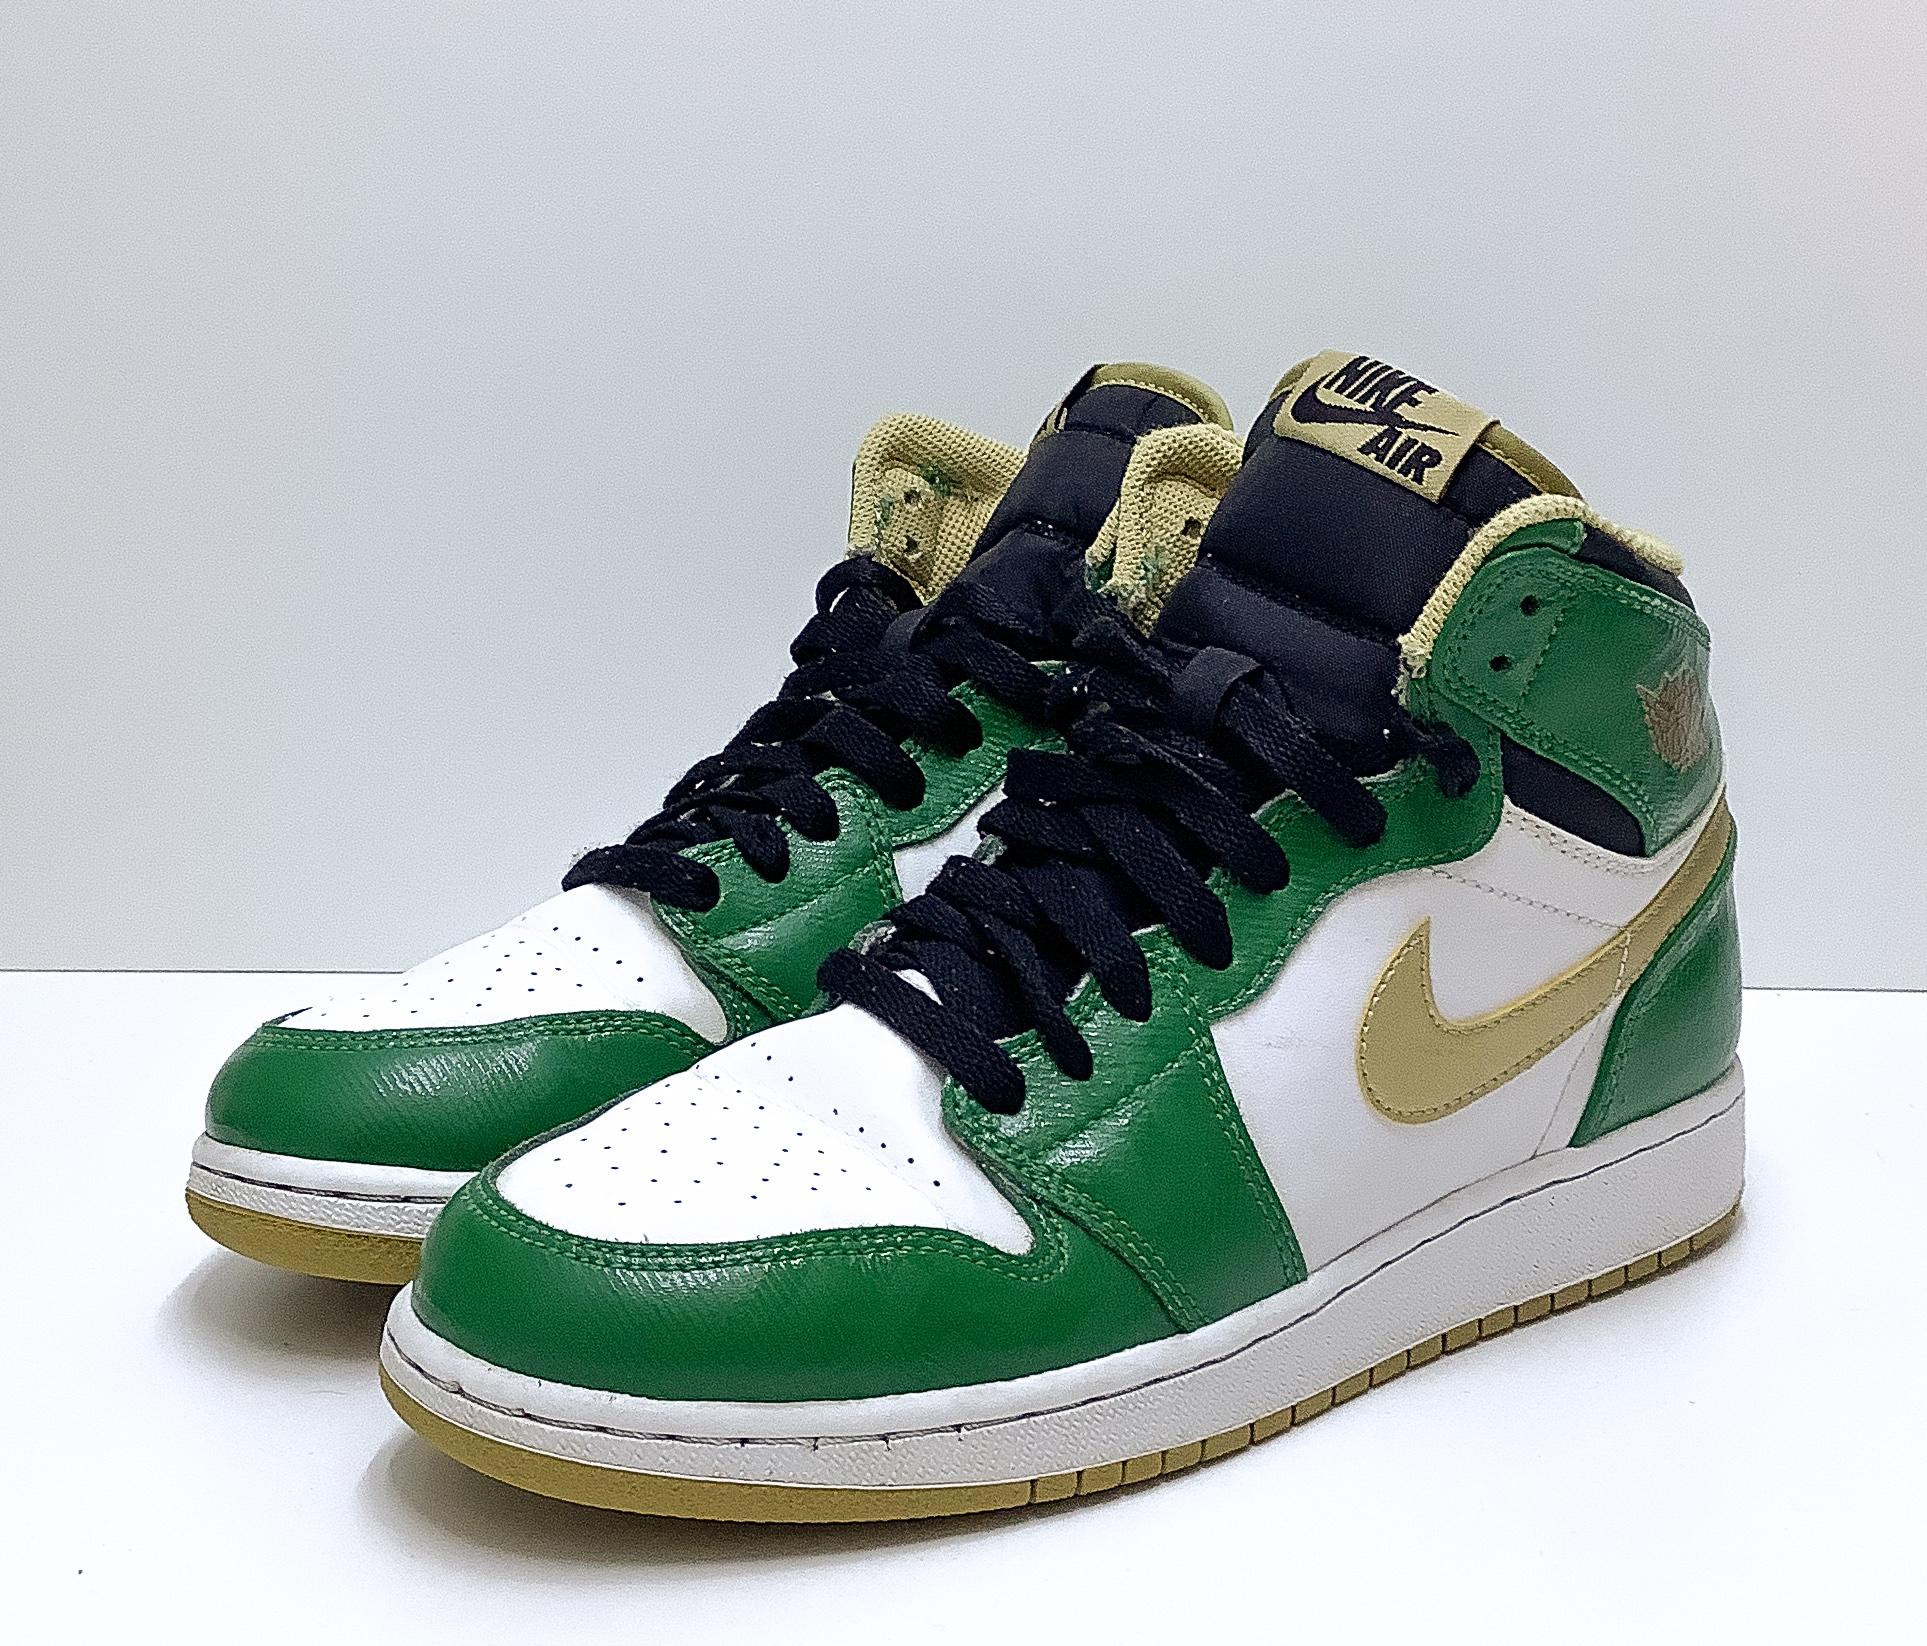 Jordan 1 Retro High Celtics (GS)